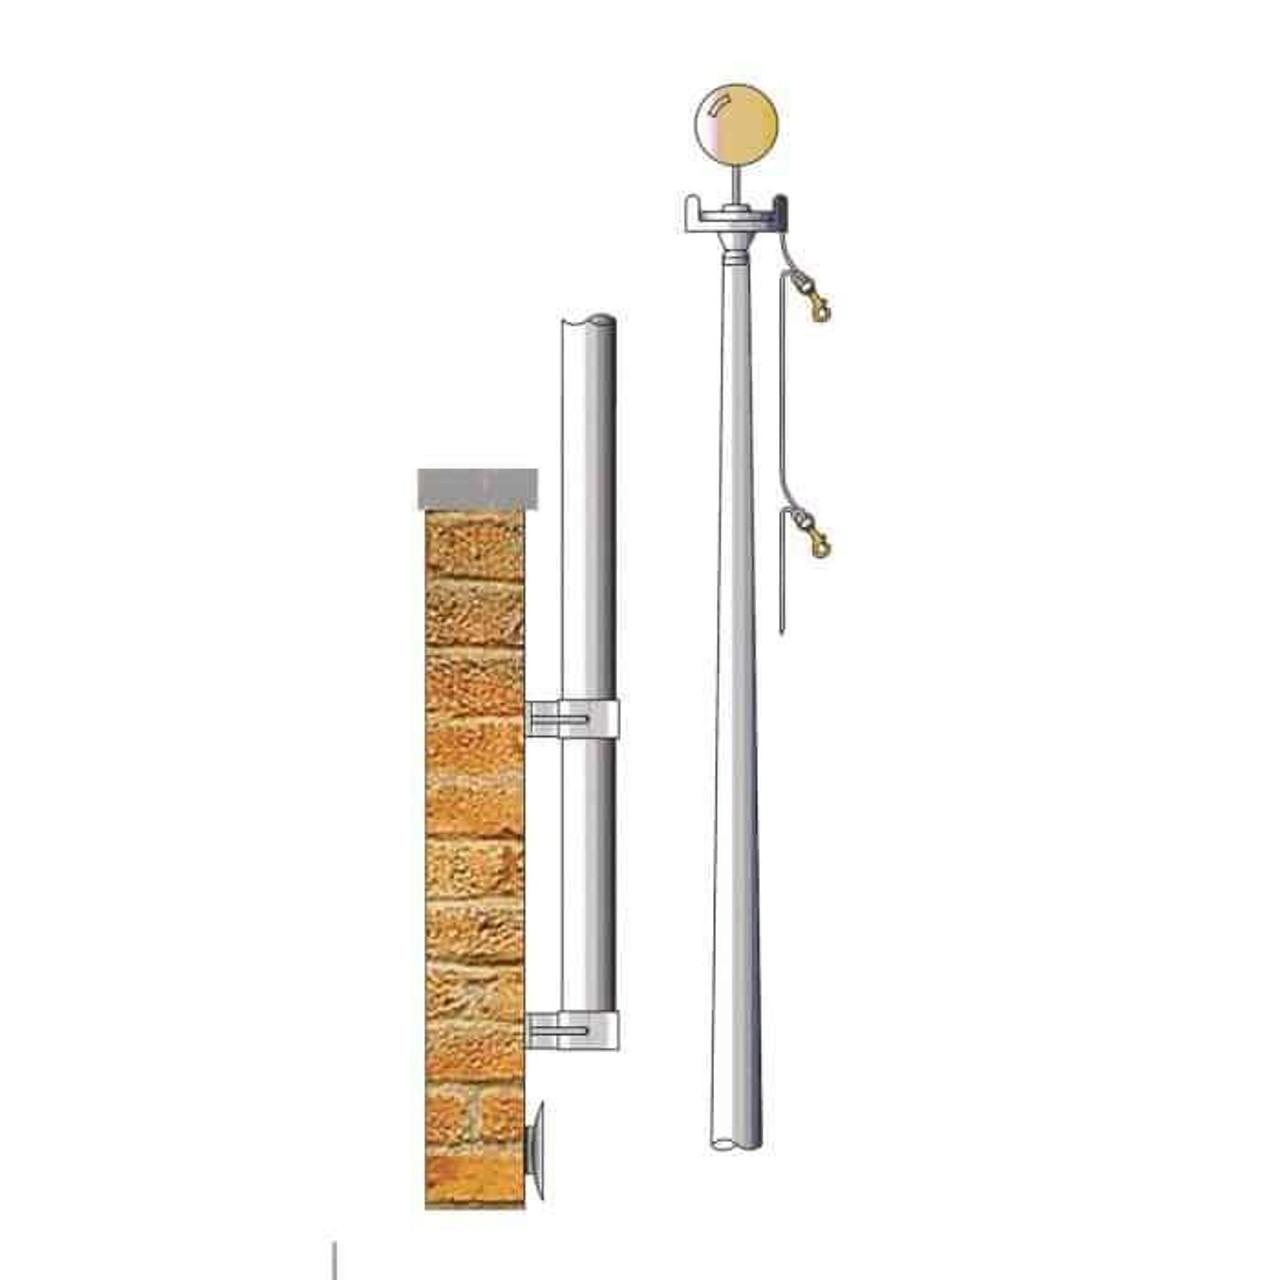 10 Vertical Wall Mounted Flagpole EVWM10